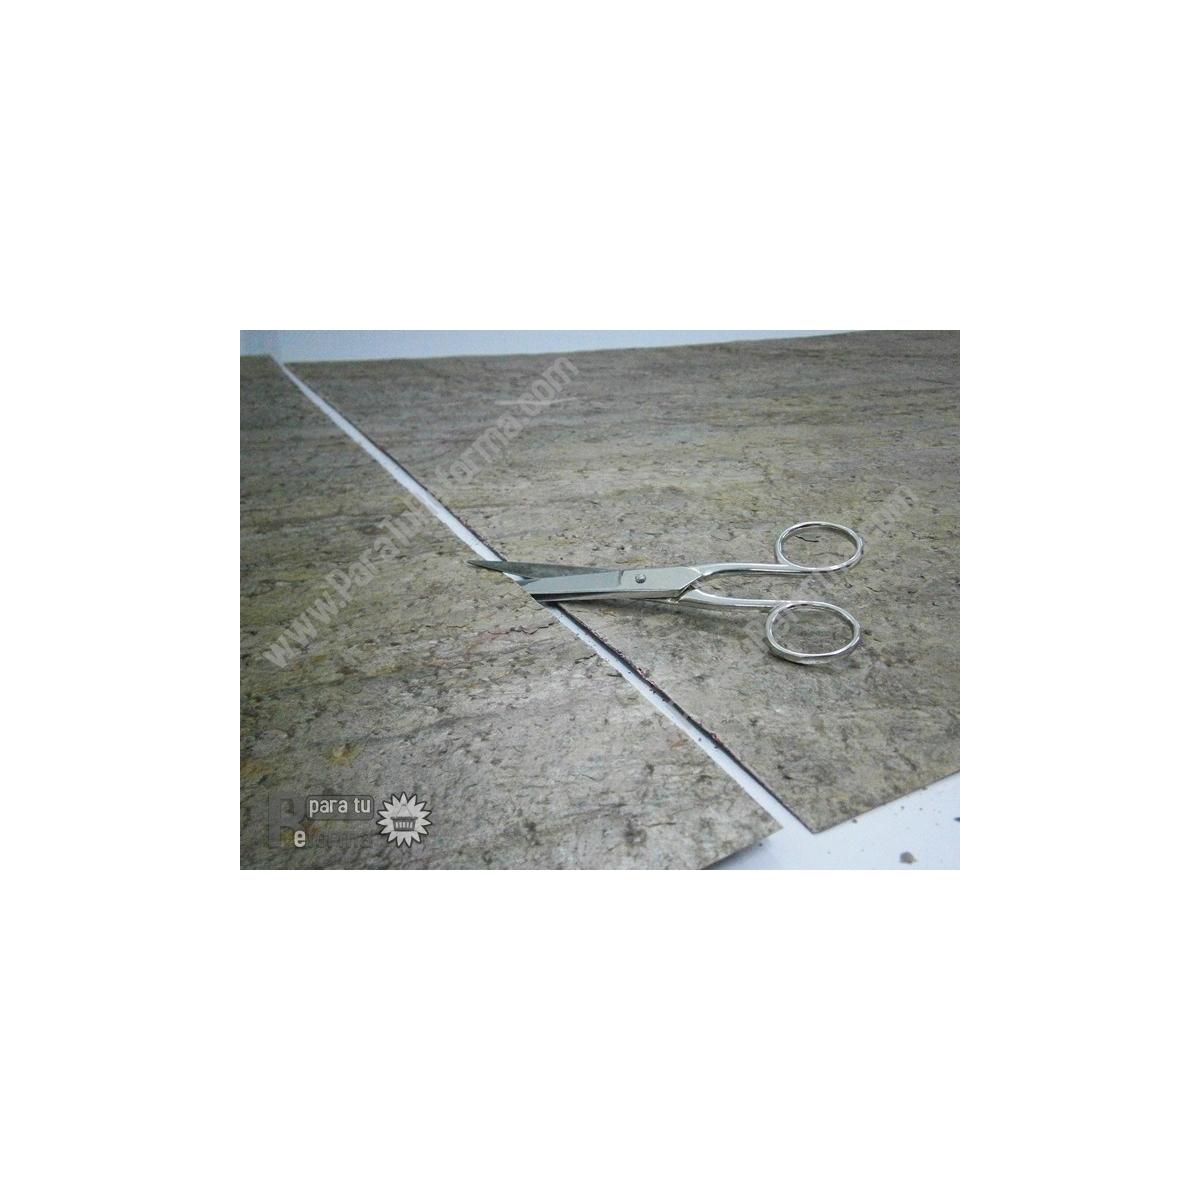 Pizarra natural flexible FS6012 / FT3012 - Revestimiento con Pizarra natural flexible